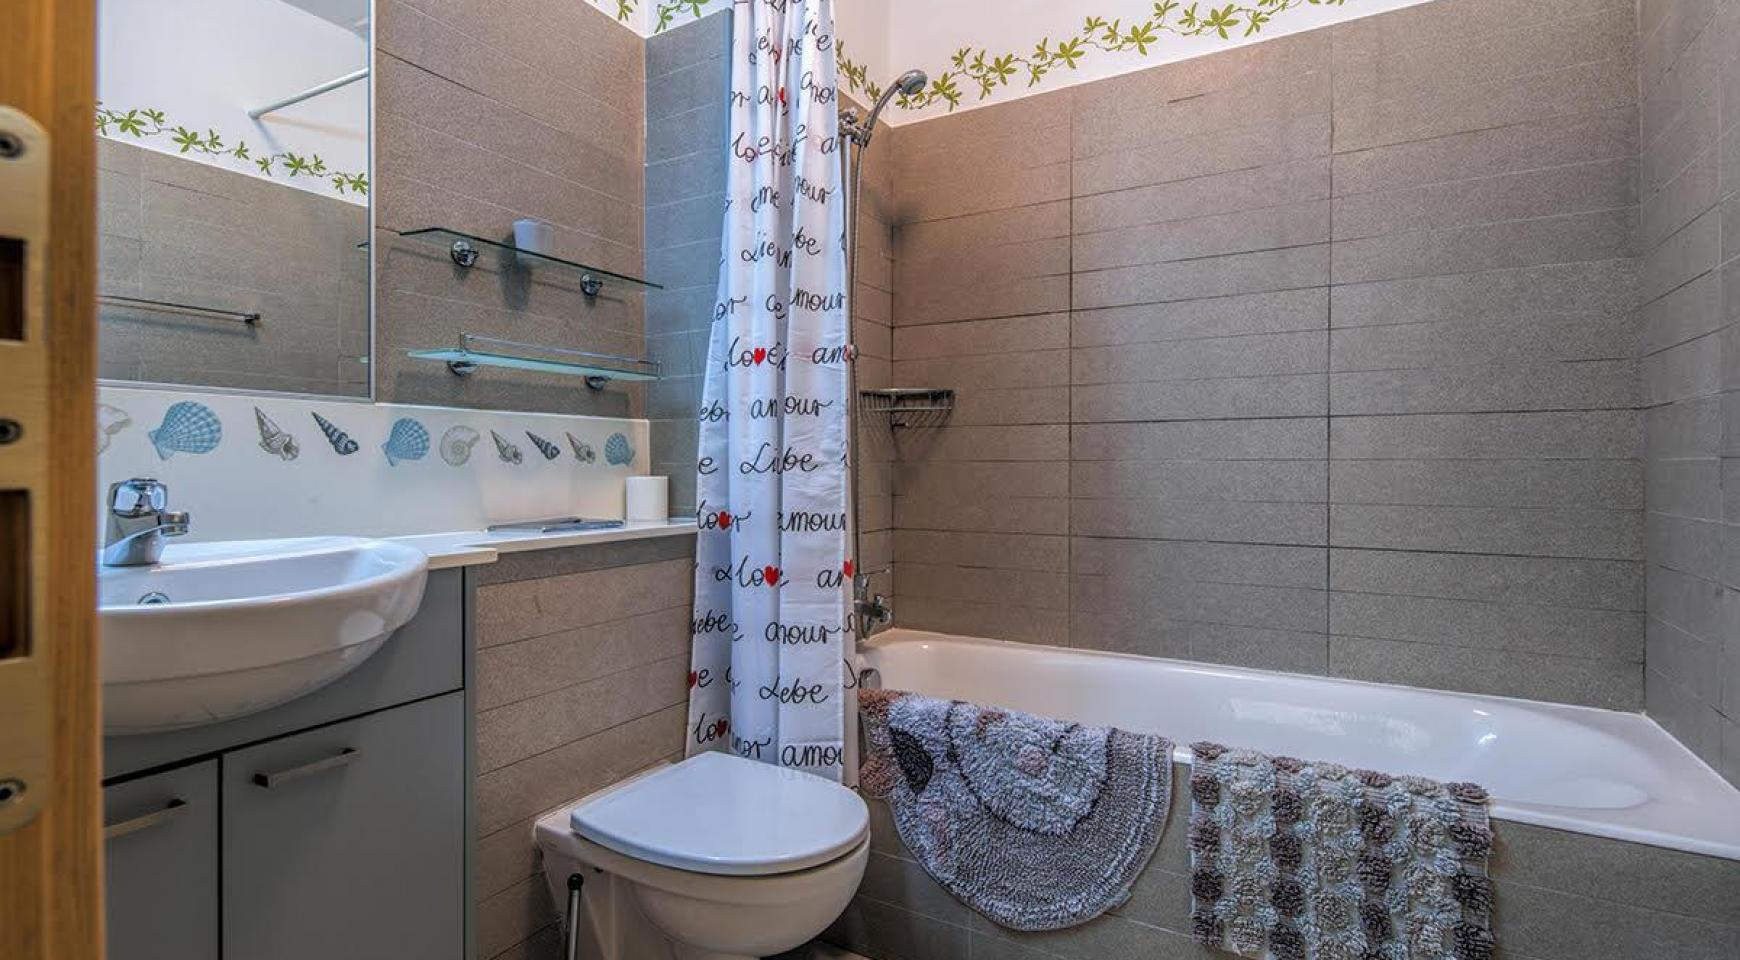 2 Bedroom Duplex Apartment Amathusa O 104 in a Prestigious Complex near the Sea  - 15